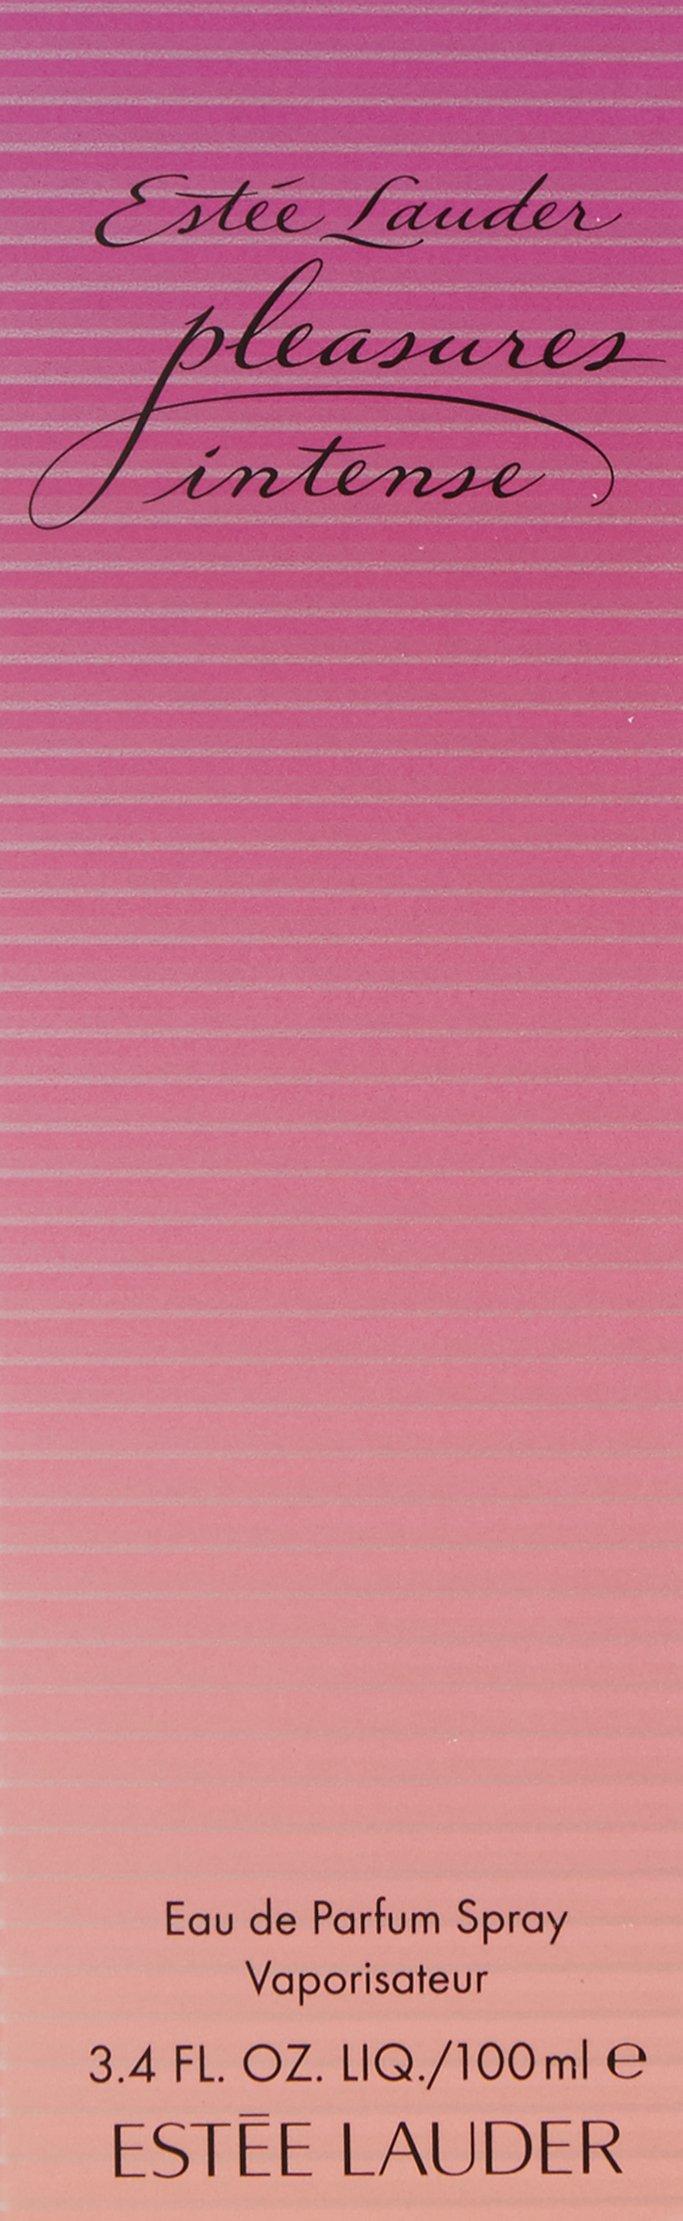 Estee Lauder Pleasures Intense – Agua De Perfume 100ml